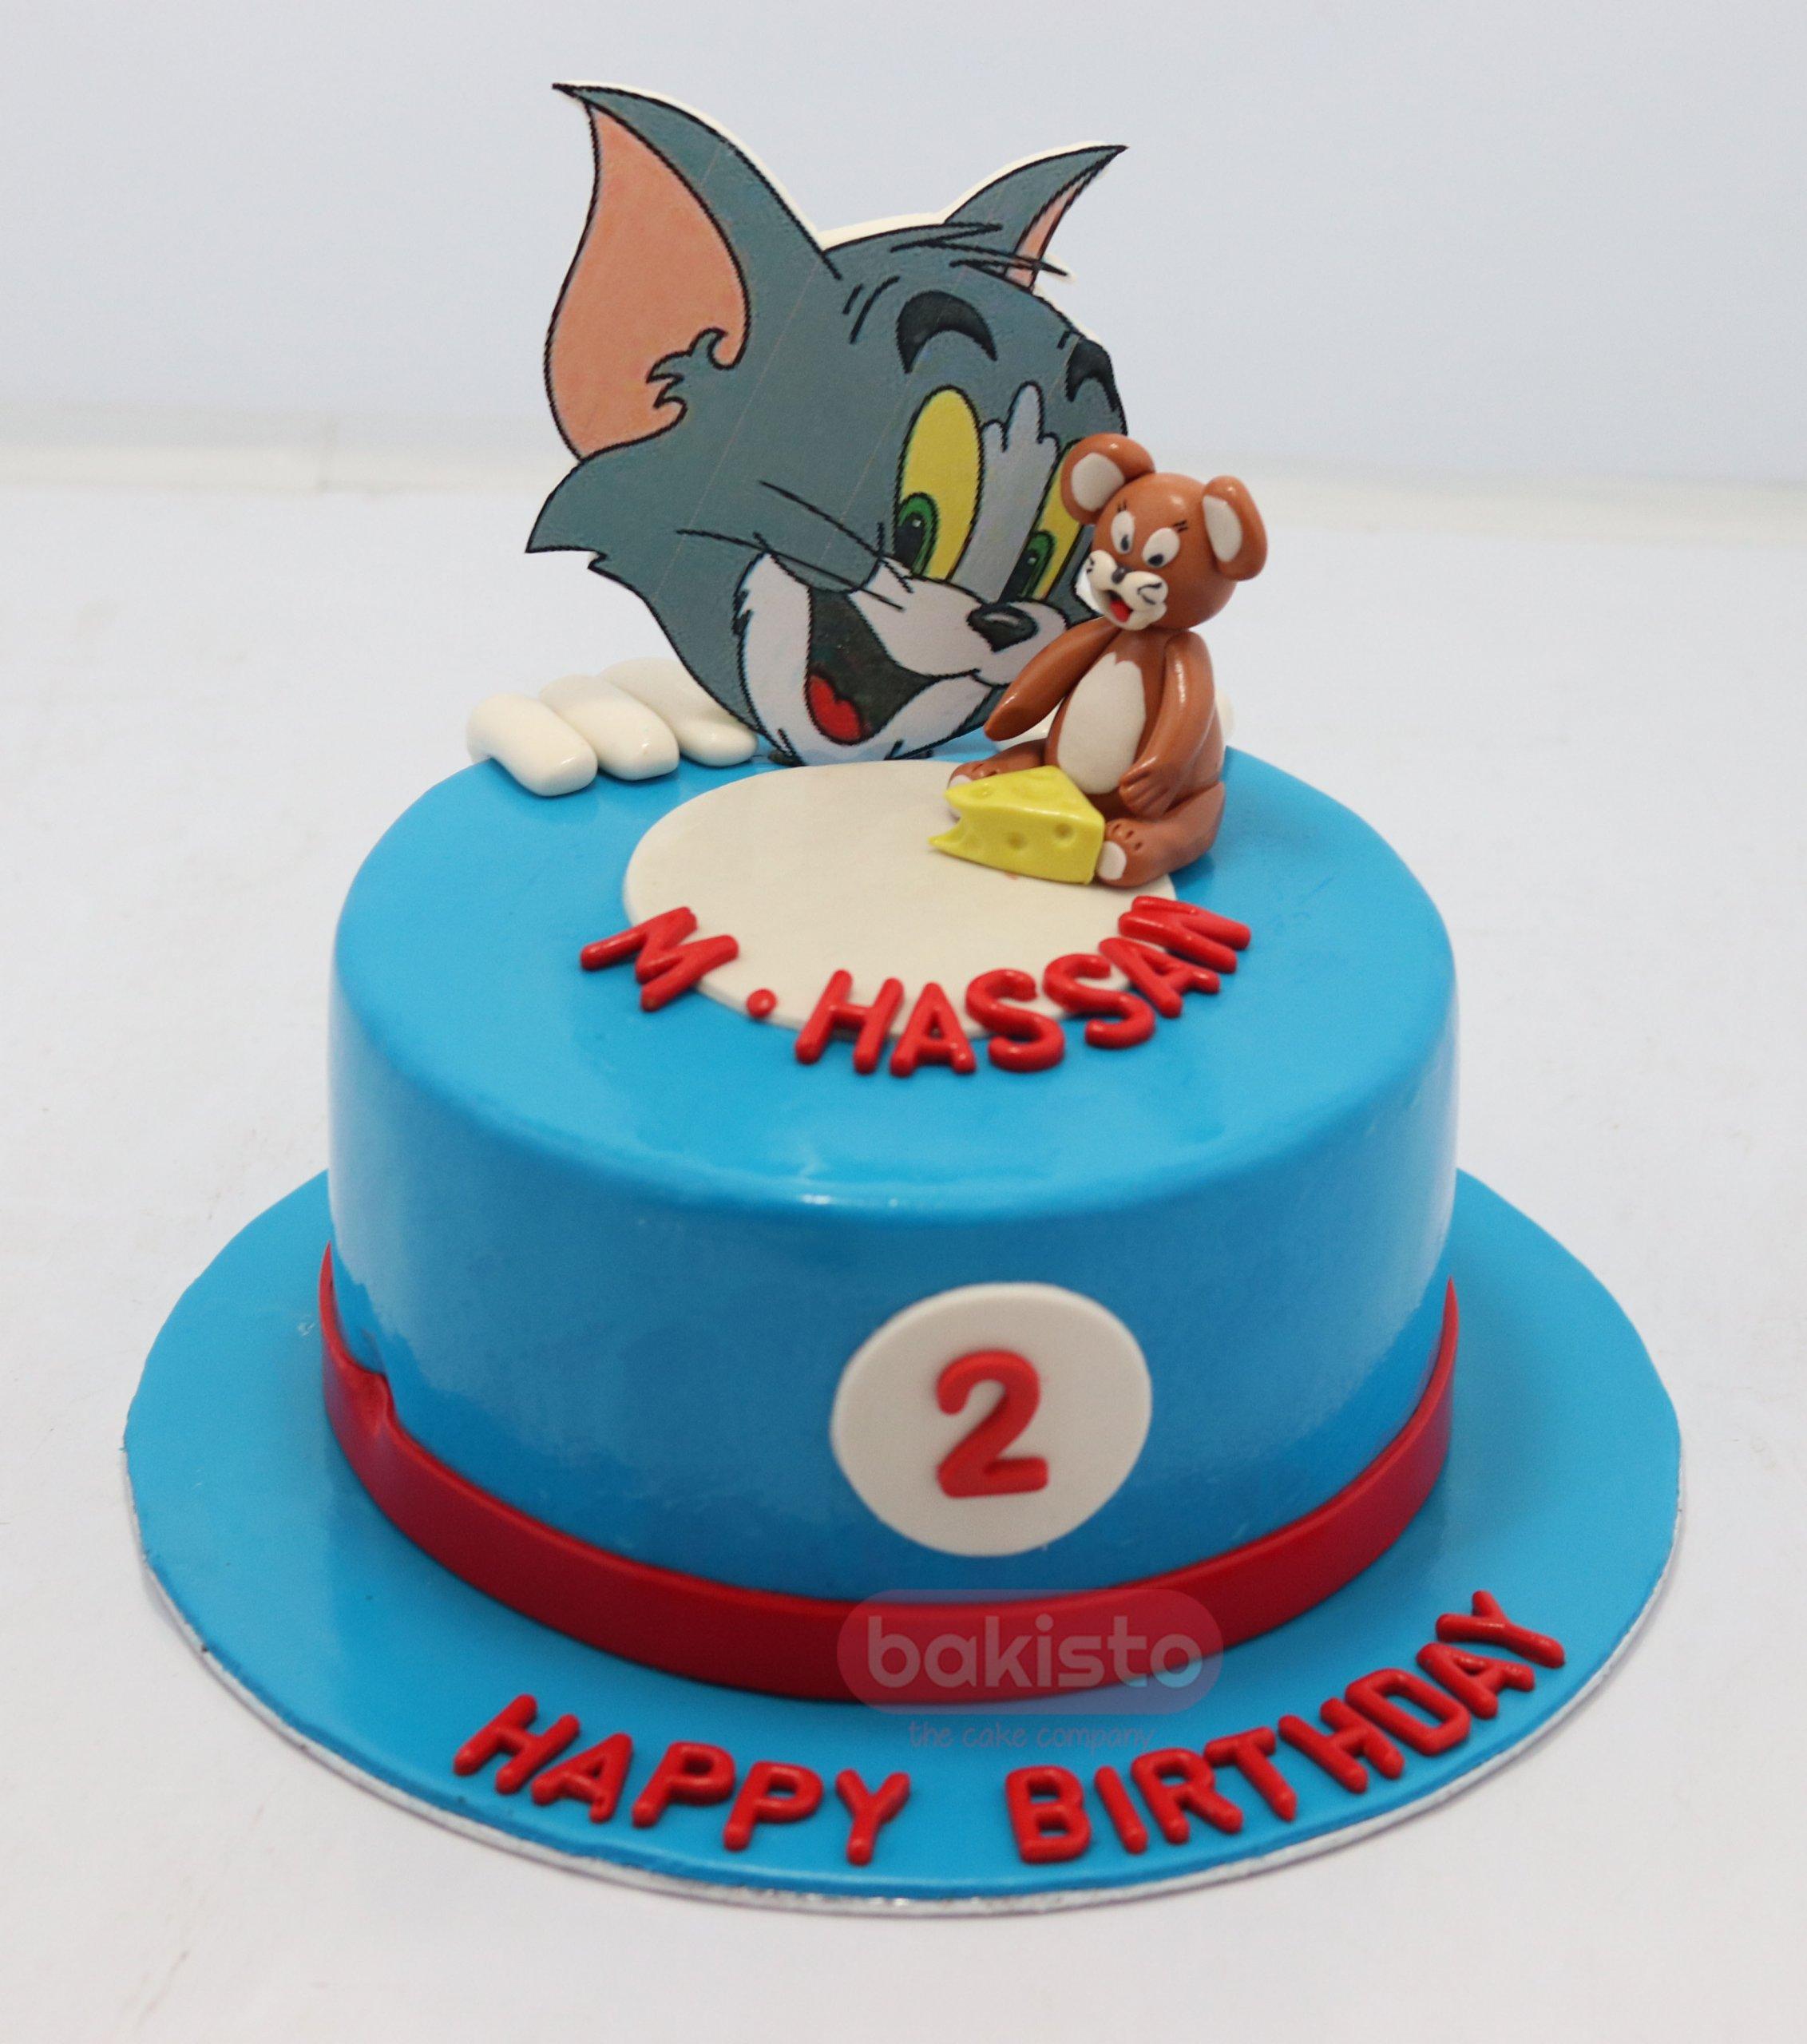 Superb Customized Tom And Jerry Theme Birthday Cake By Bakisto Birthday Cards Printable Trancafe Filternl